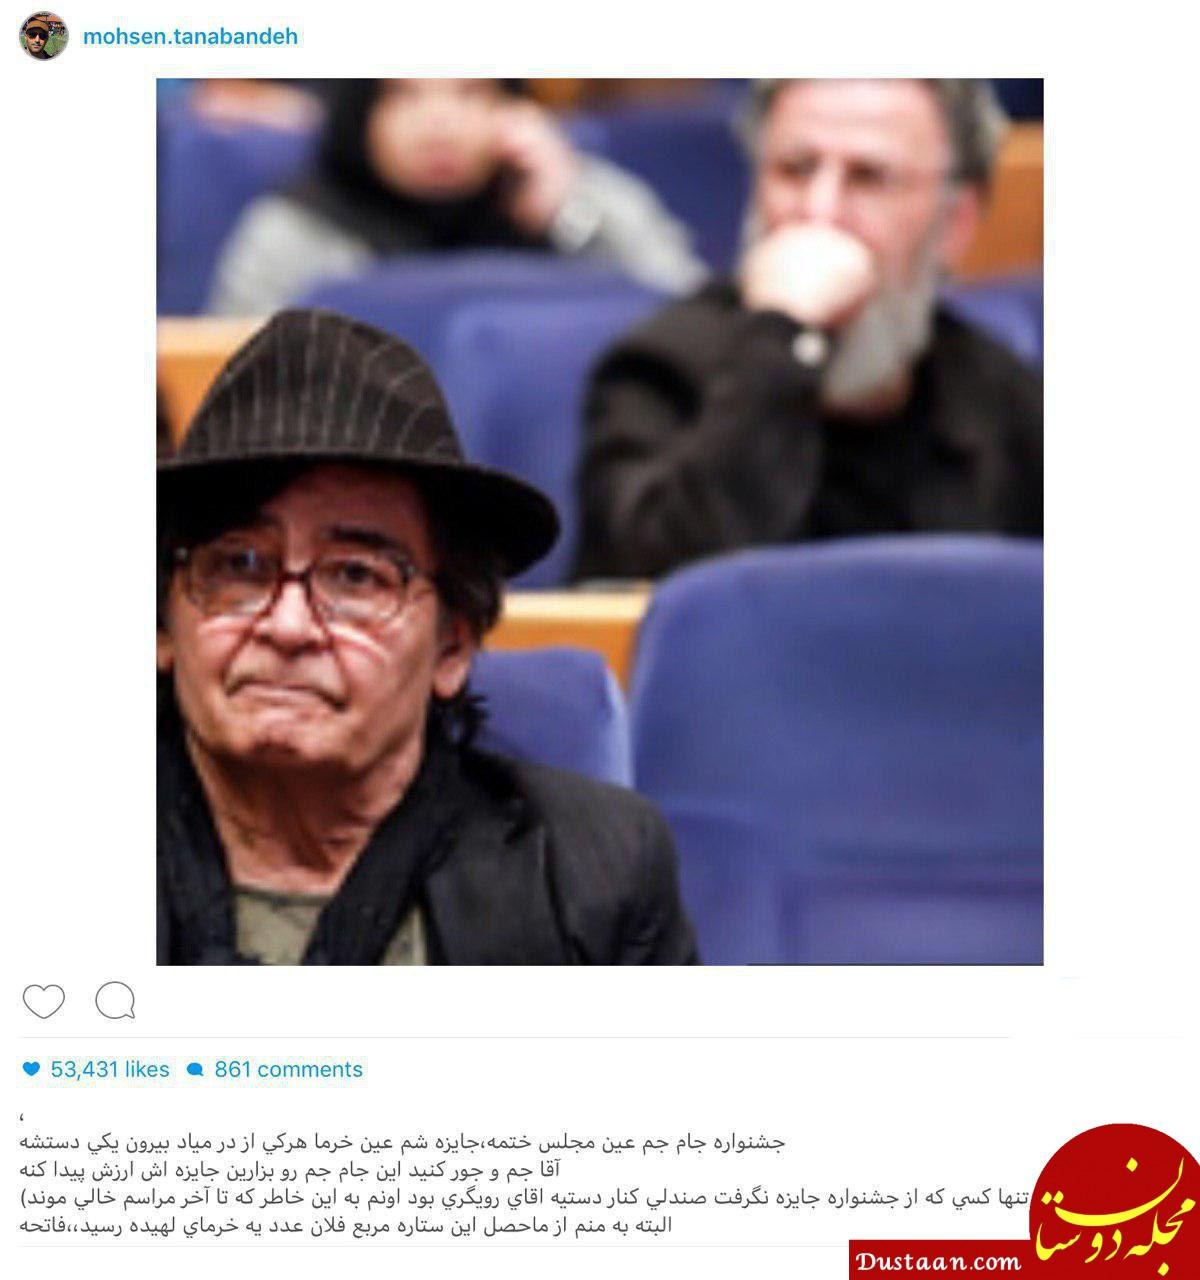 www.dustaan.com واکنش تند اینستاگرامی محسن تنابنده نسبت به برگزاری و جوایز جشنواره جام جم